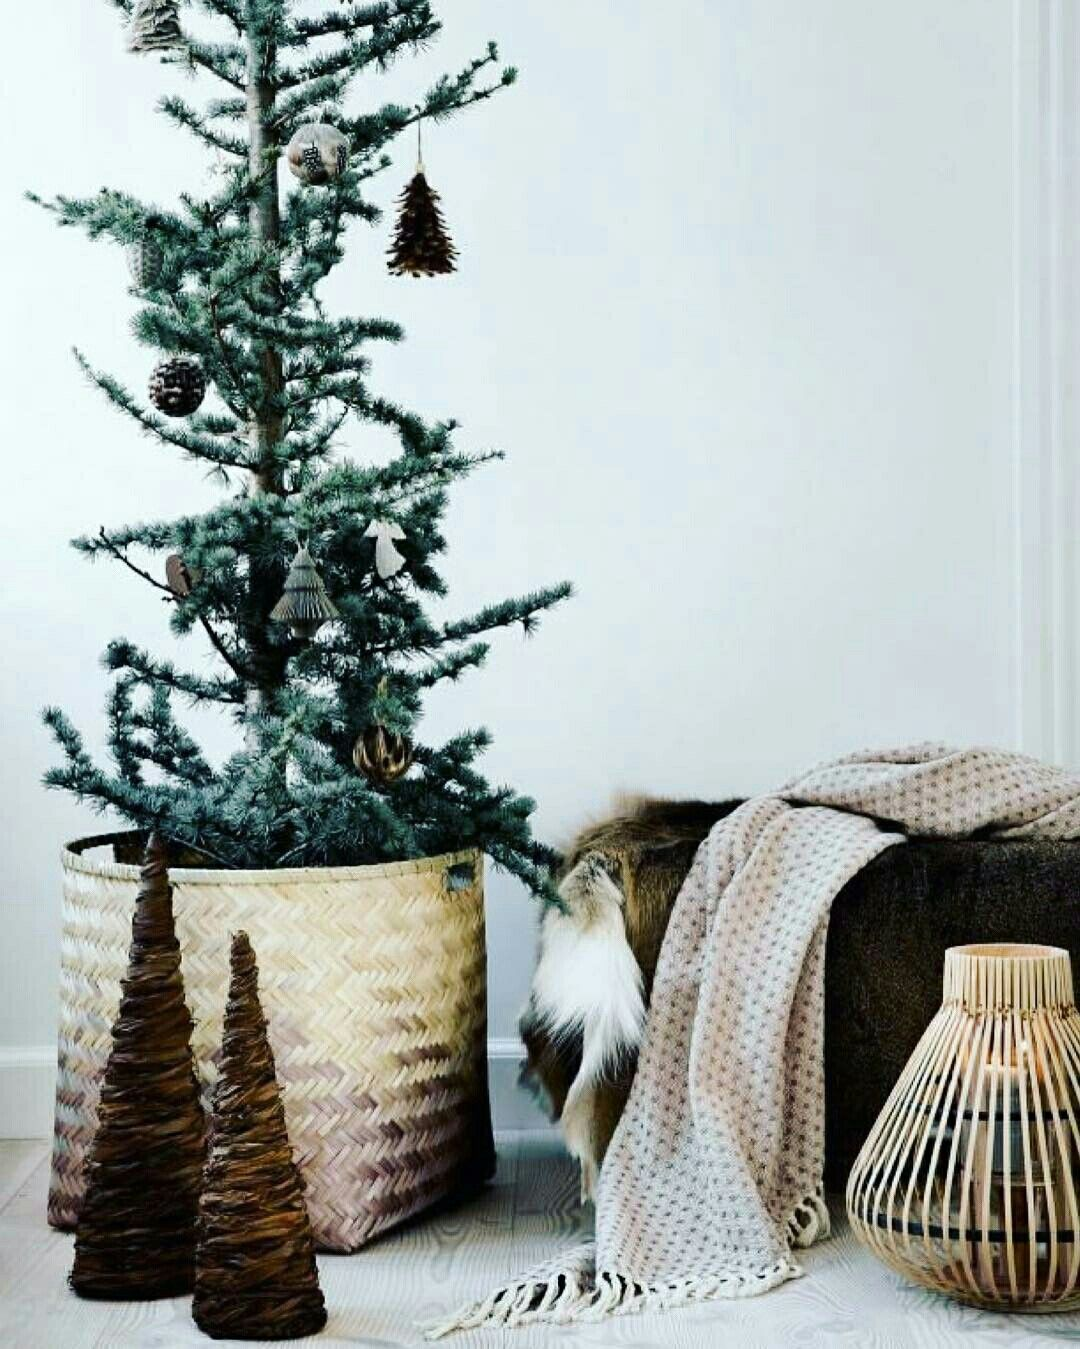 Natural Christmas Tree @aquellespetitescosesbcn